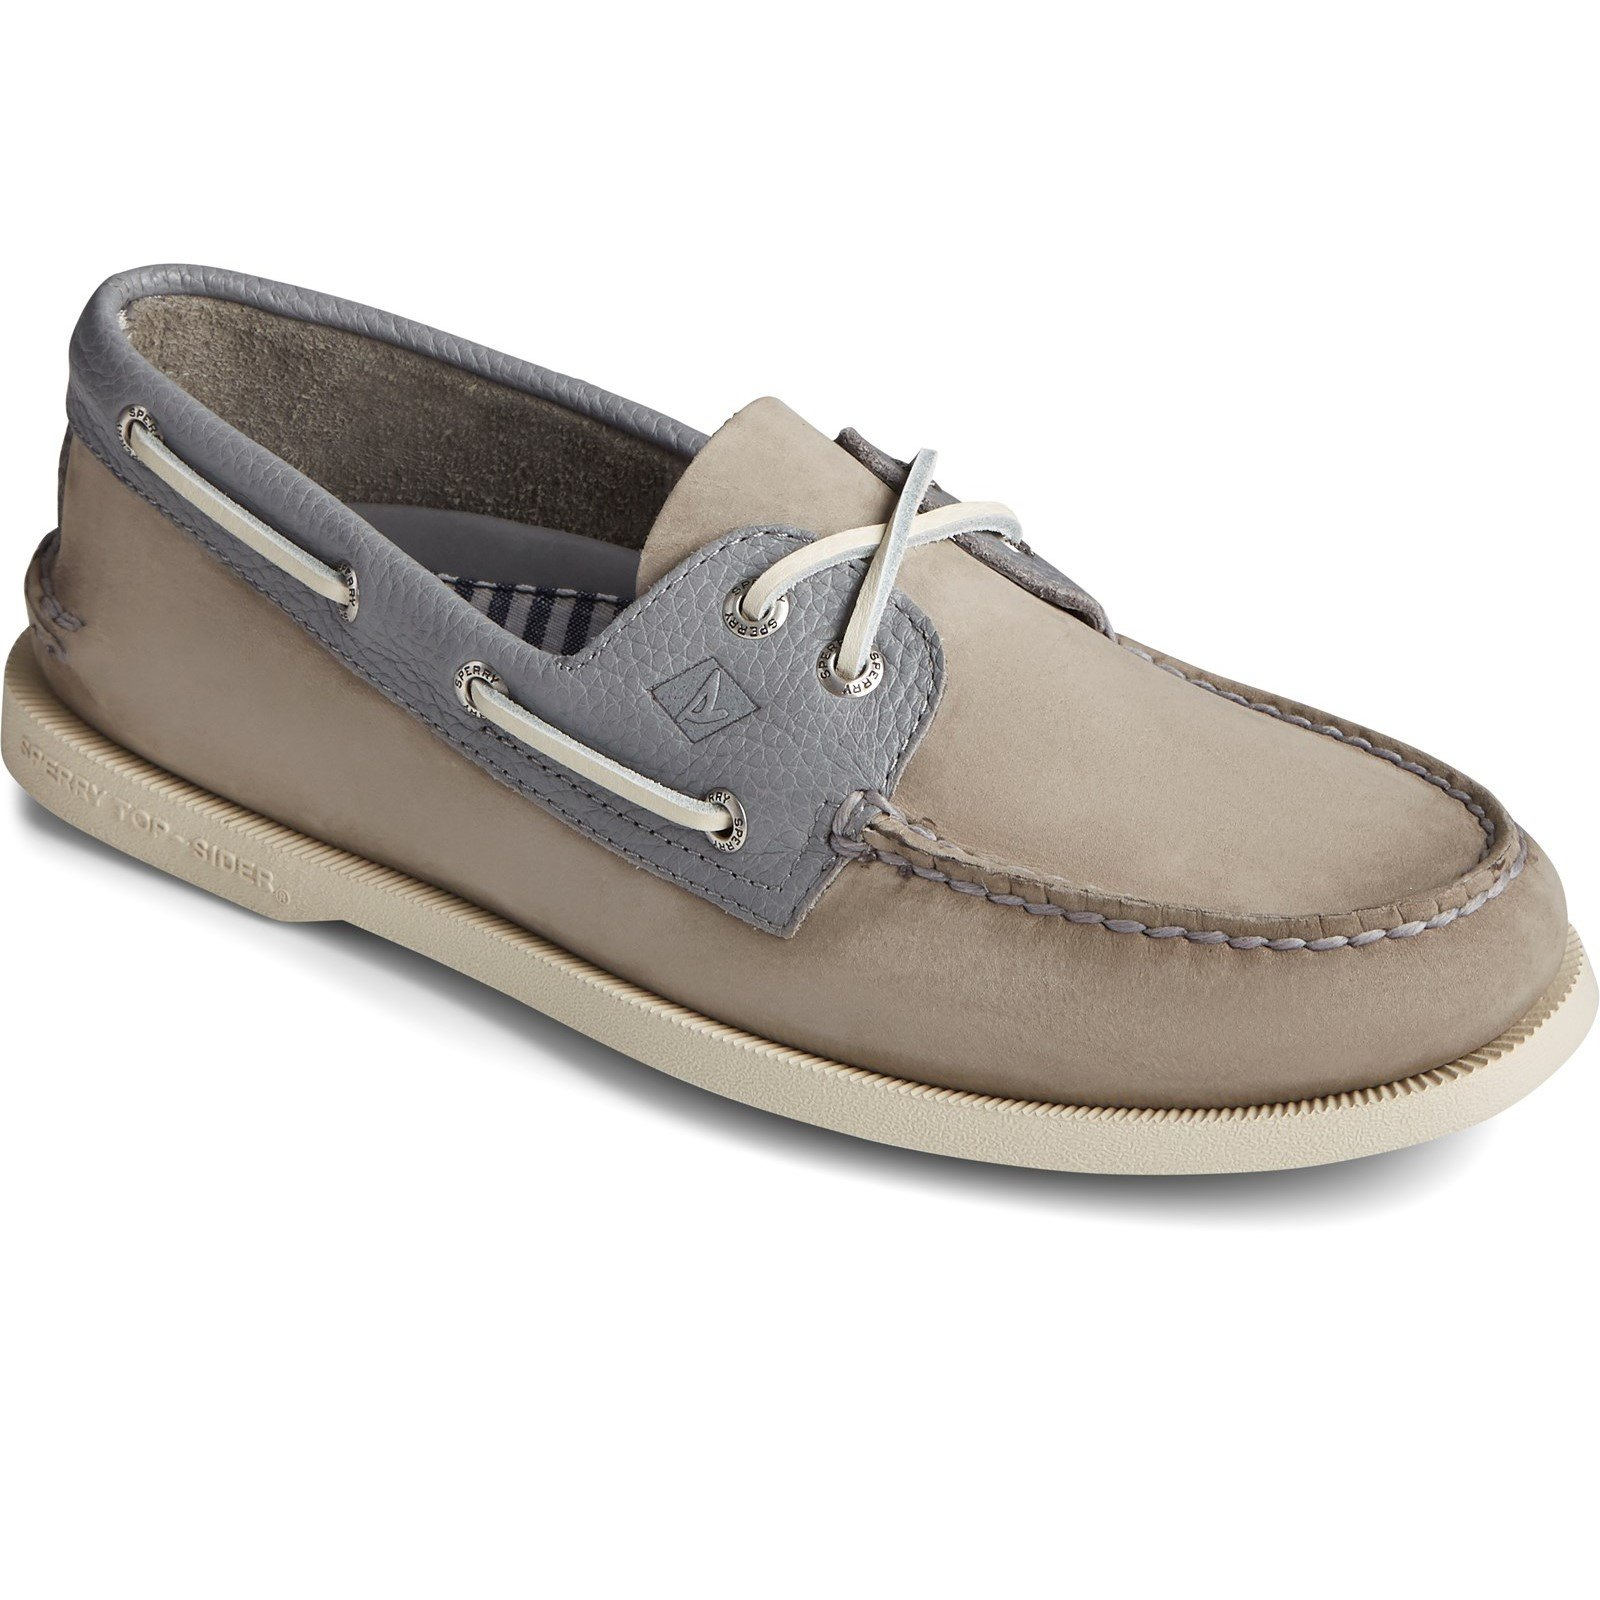 Sperry Men's A/O 2-Eye Nubuck Boat Shoe Various Colours 32920 - Grey 11